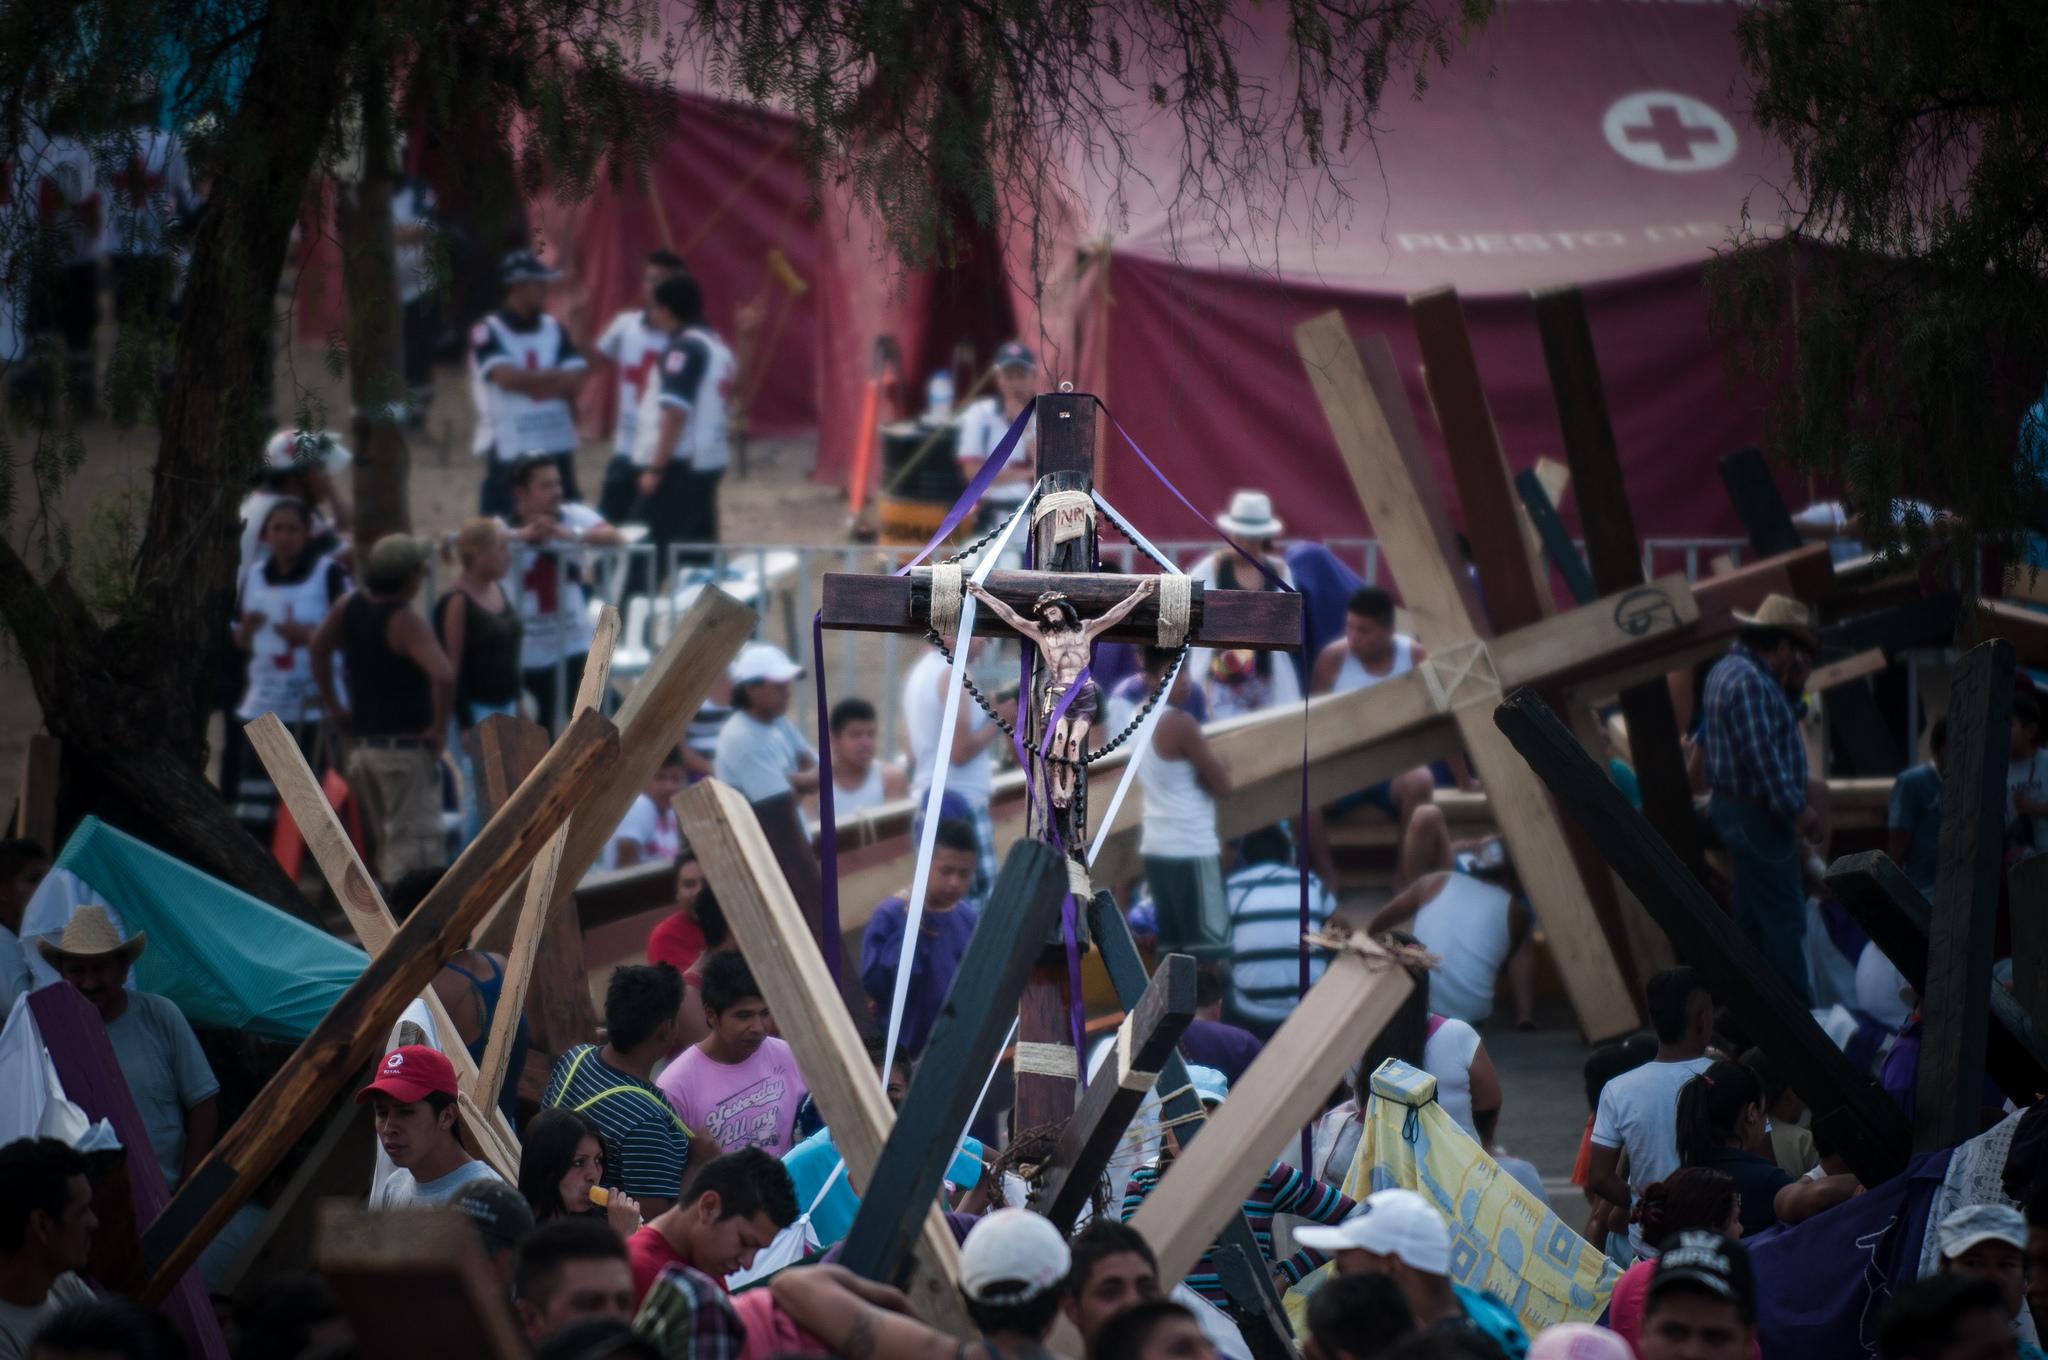 One of the popular religious celebrations in Iztapalapa | © Eneas De Troya/Flickr